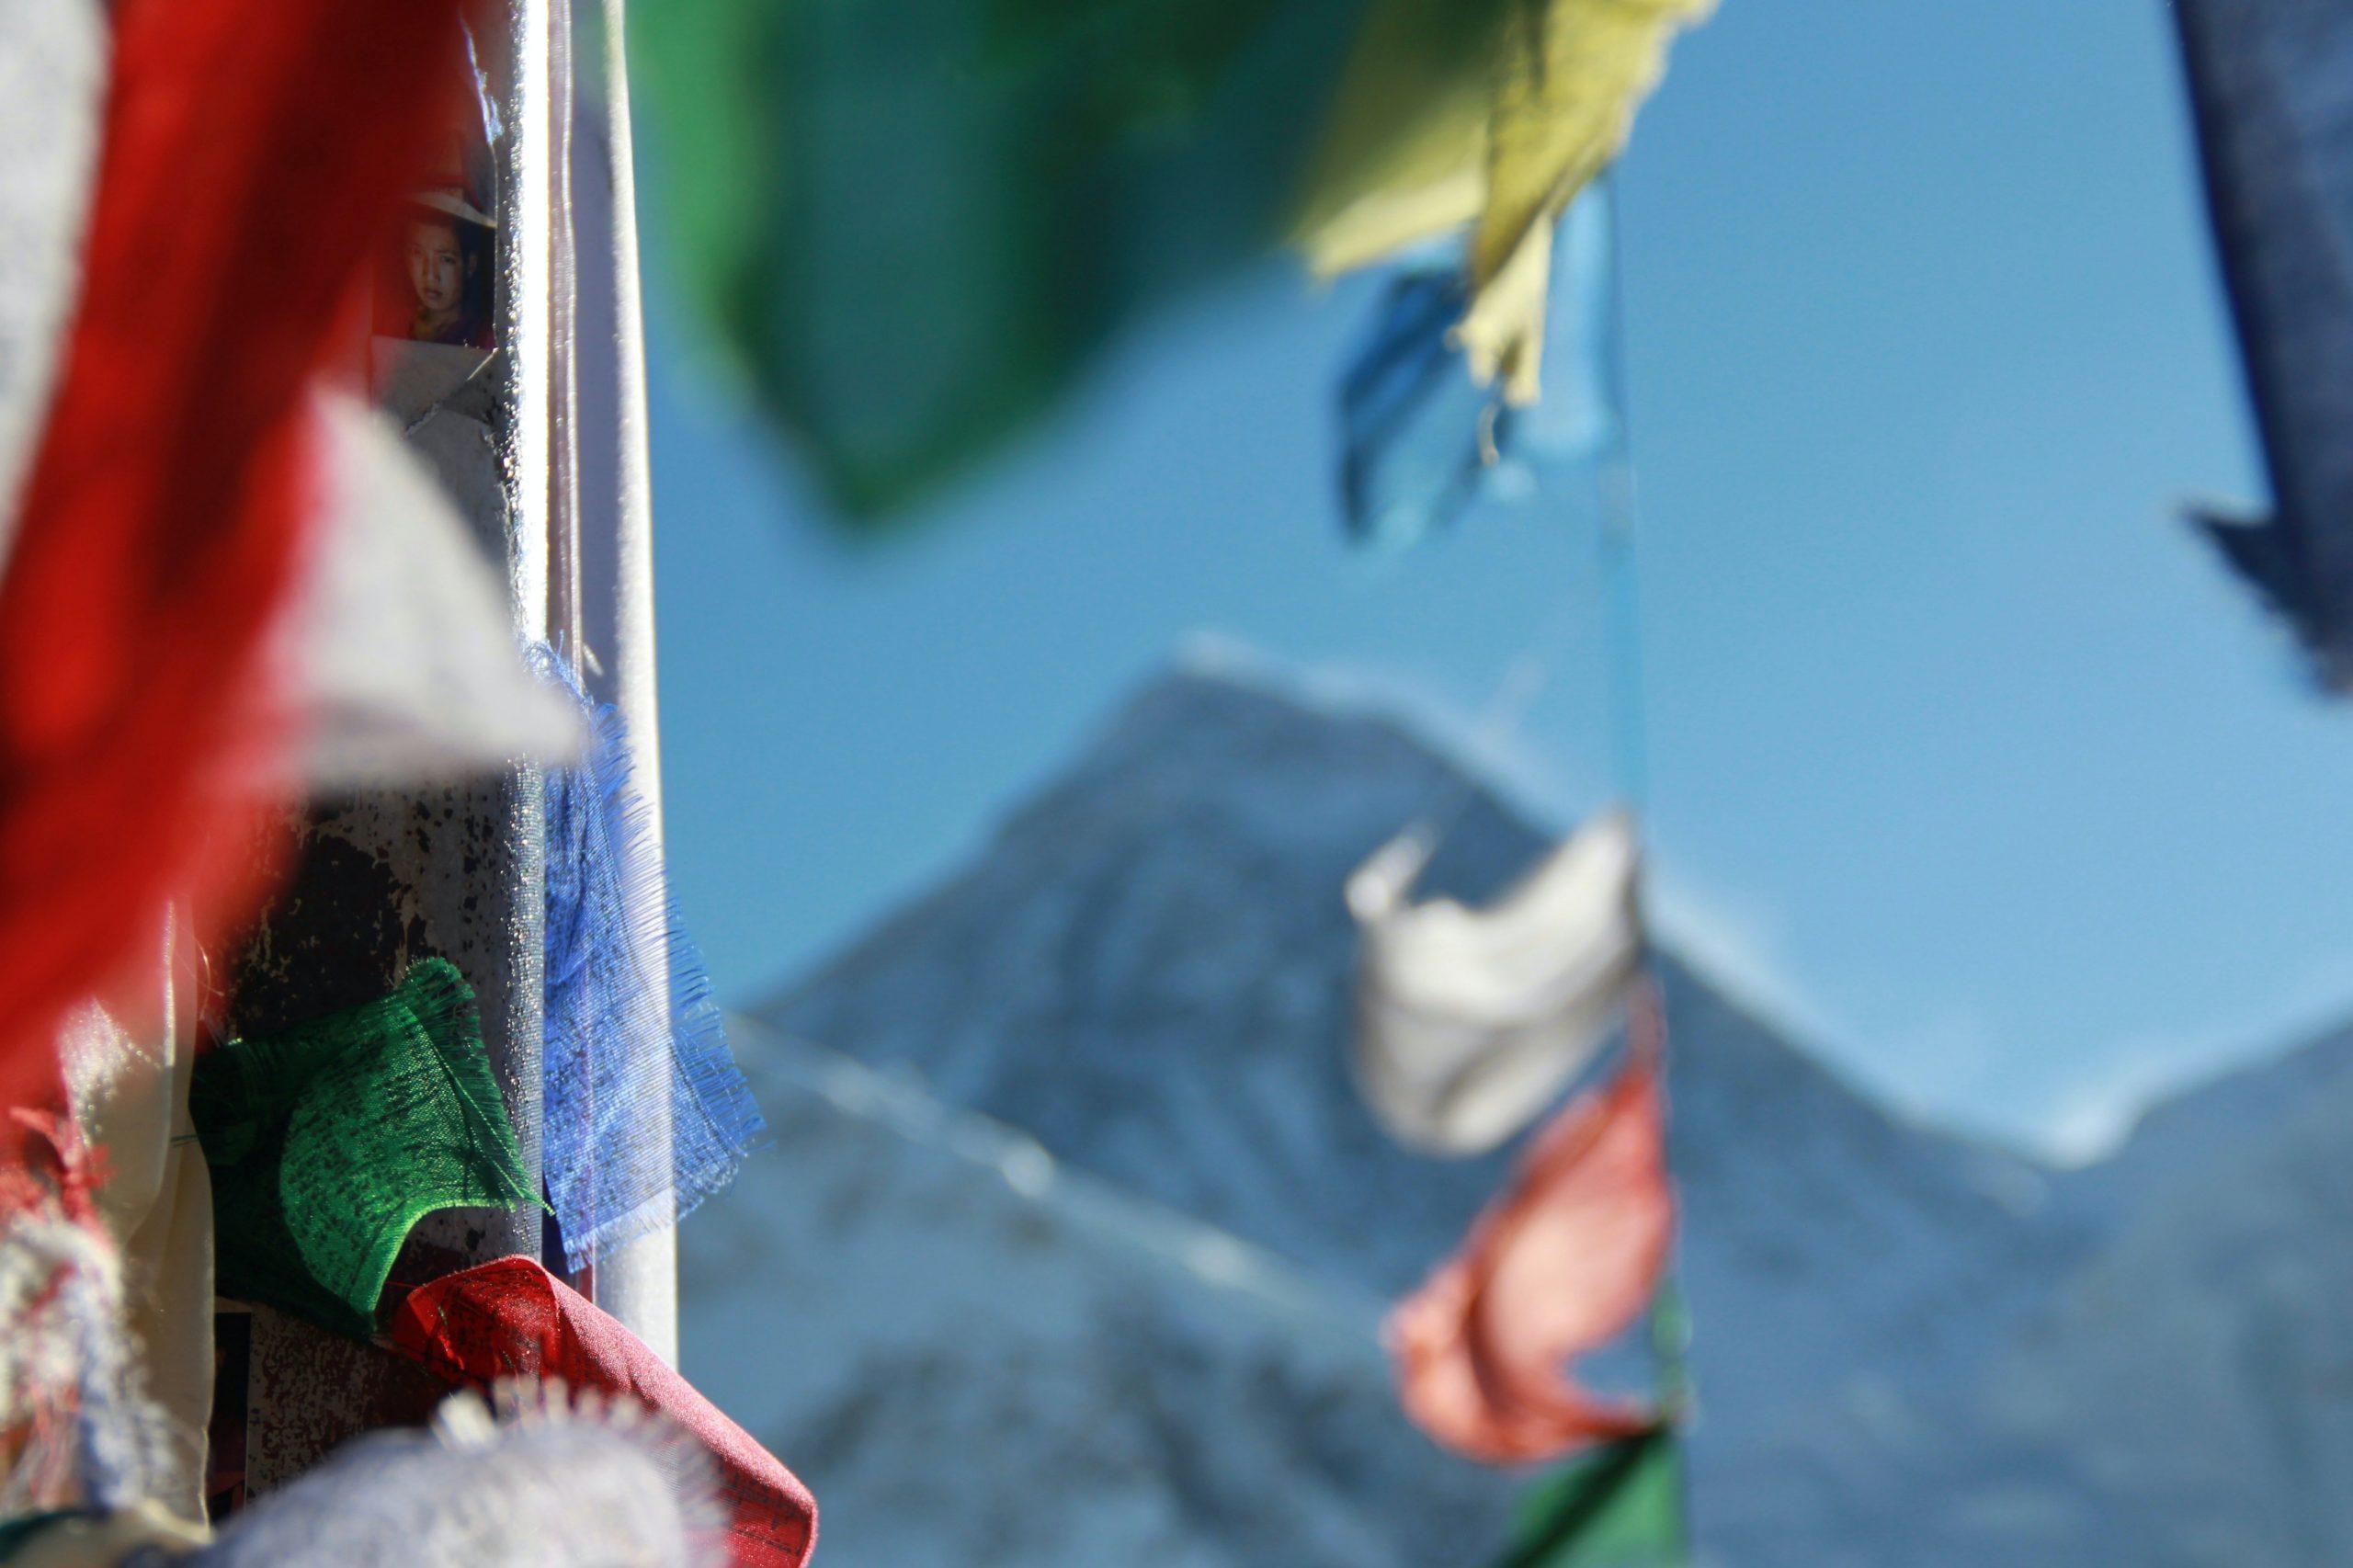 Everest base camp hiking tour to Nepal